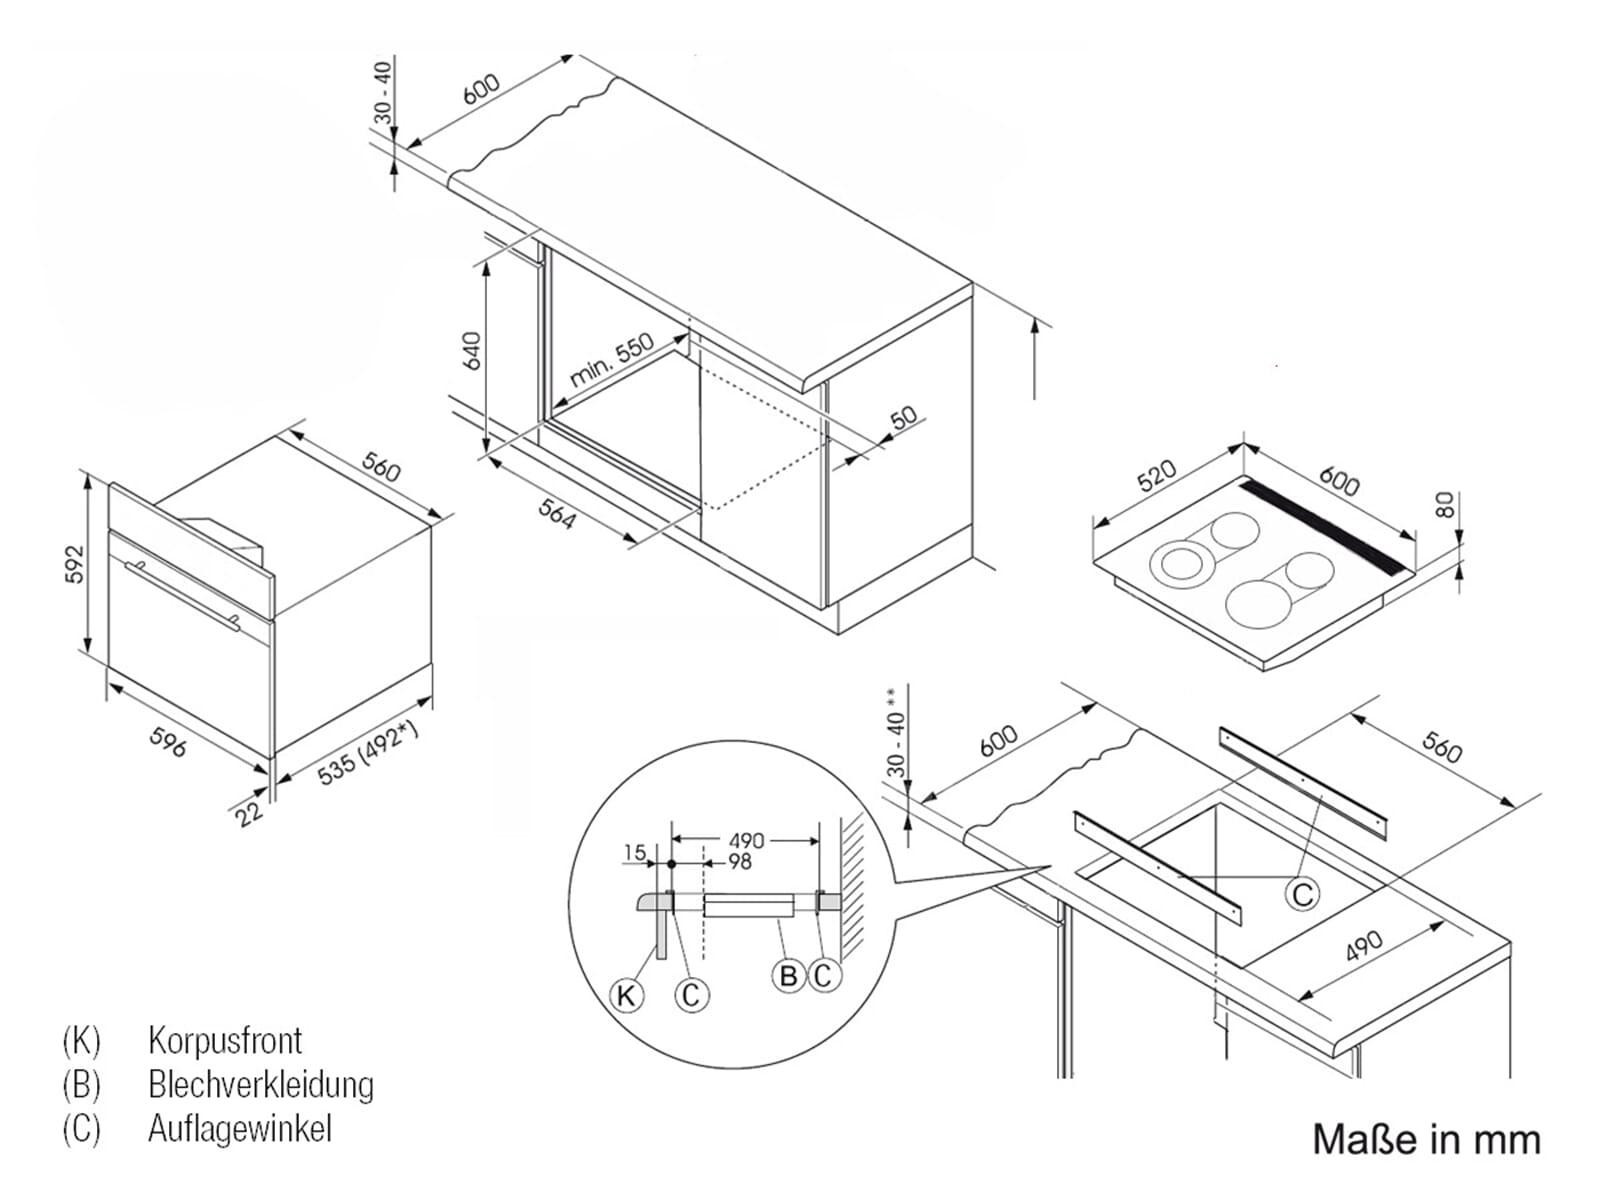 oranier set herd ehg 3010 gas unter glas kochfeld ekg 6 f r 1848 90 eur. Black Bedroom Furniture Sets. Home Design Ideas